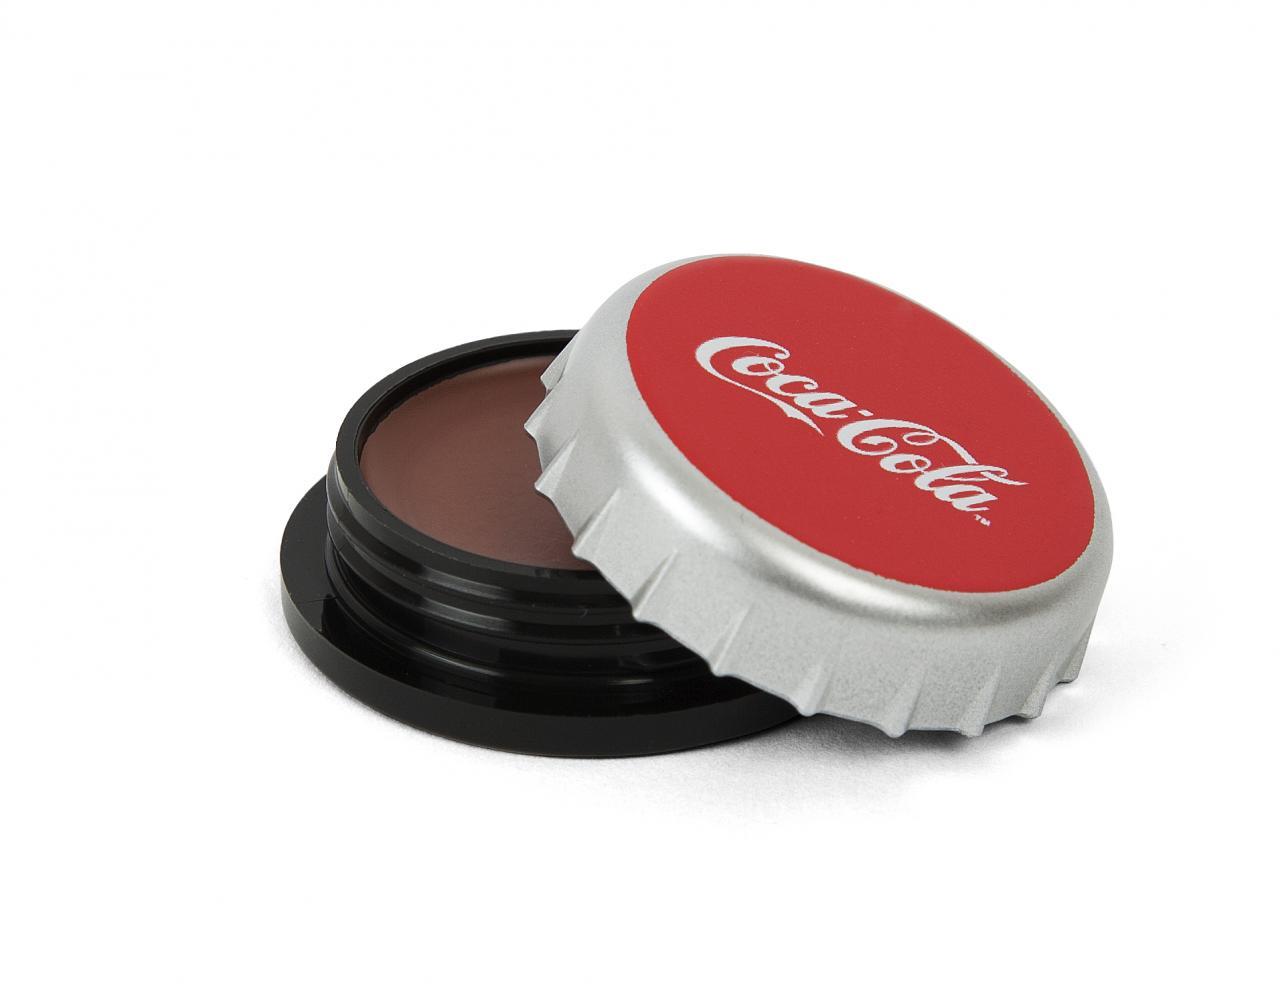 Lip Smacker Coca-Cola Bottle Cap - Classic 3,4g